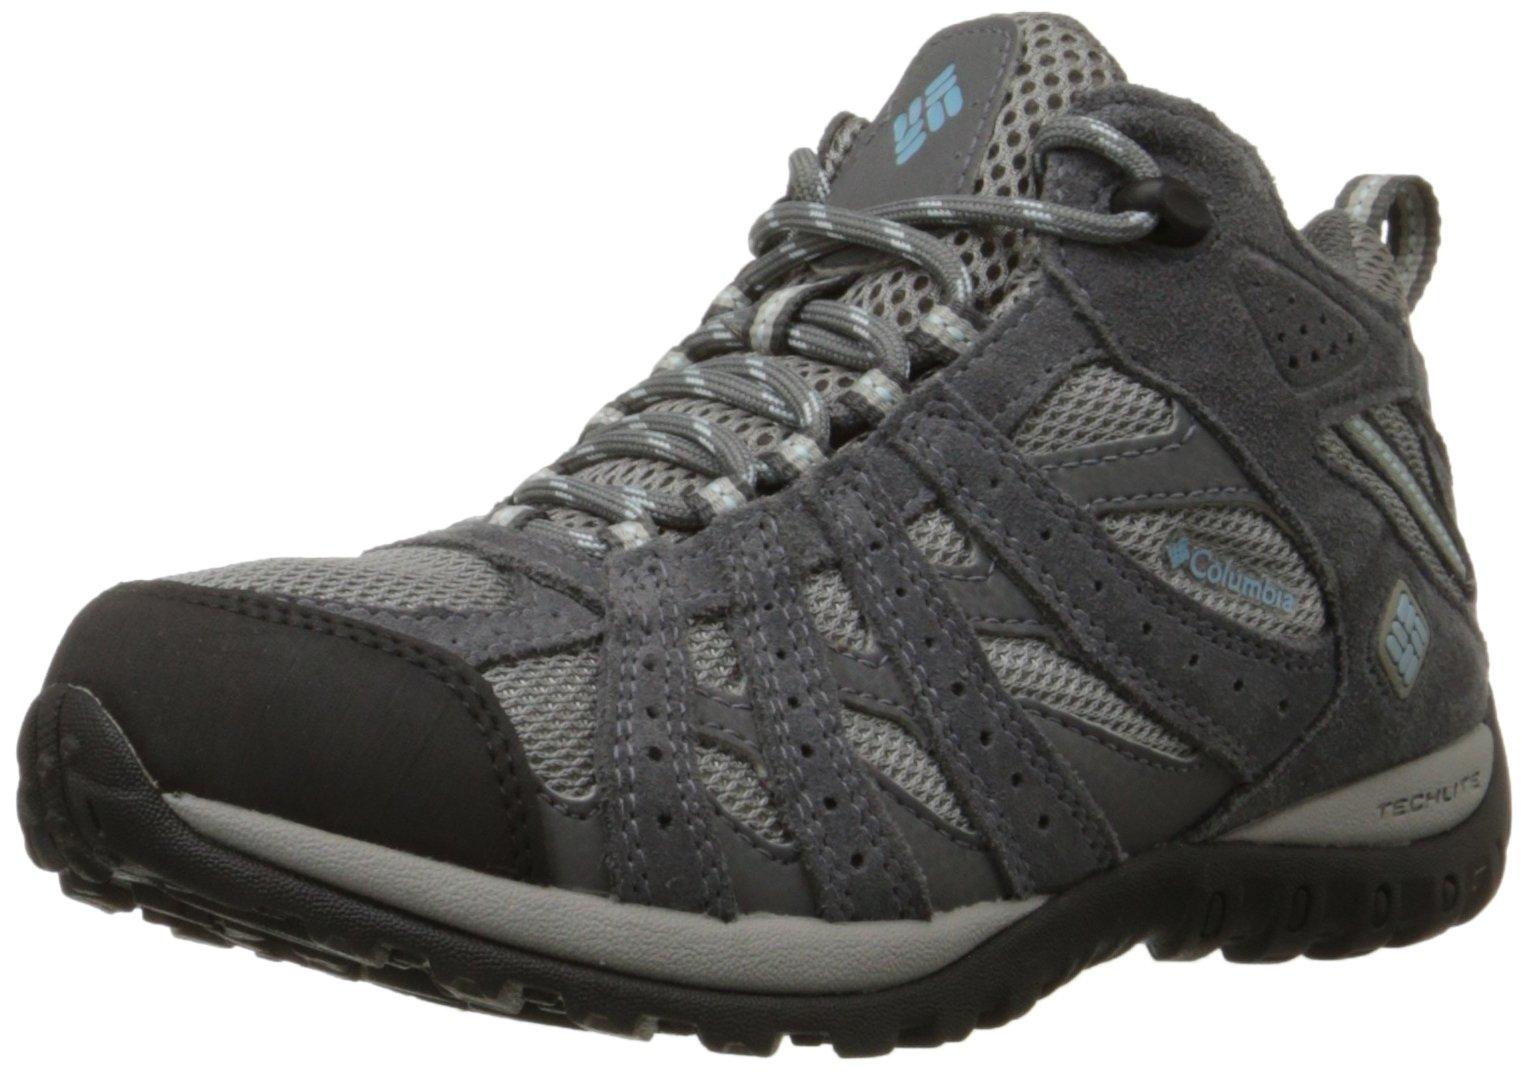 Columbia Women's Redmond Mid Waterproof Hiking Boot, Light Grey, Sky Blue, 12 B US